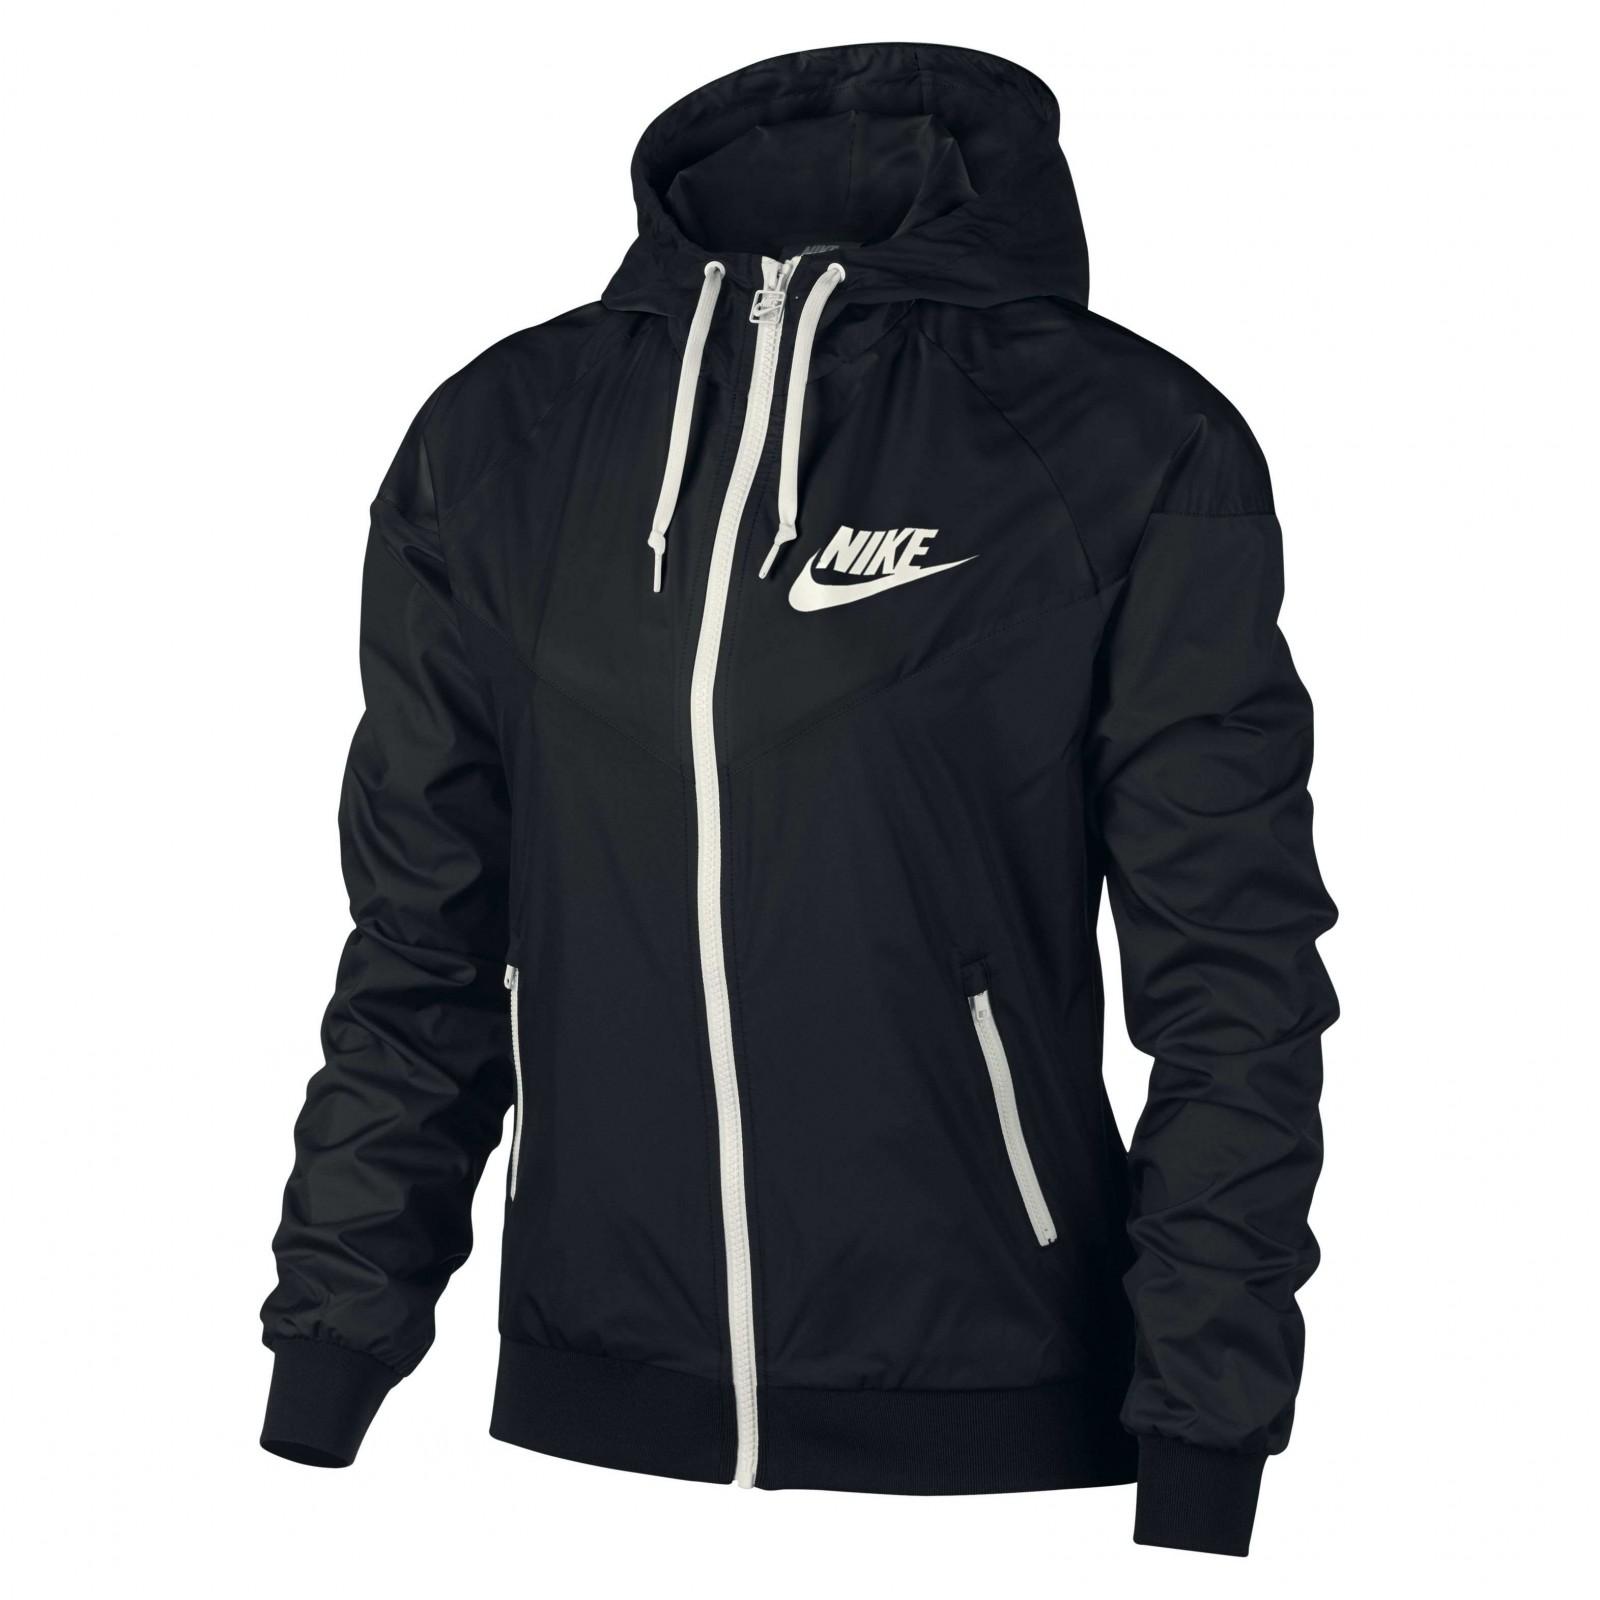 Dámská bunda Nike W NSW WR JKT OG  f111518f7c